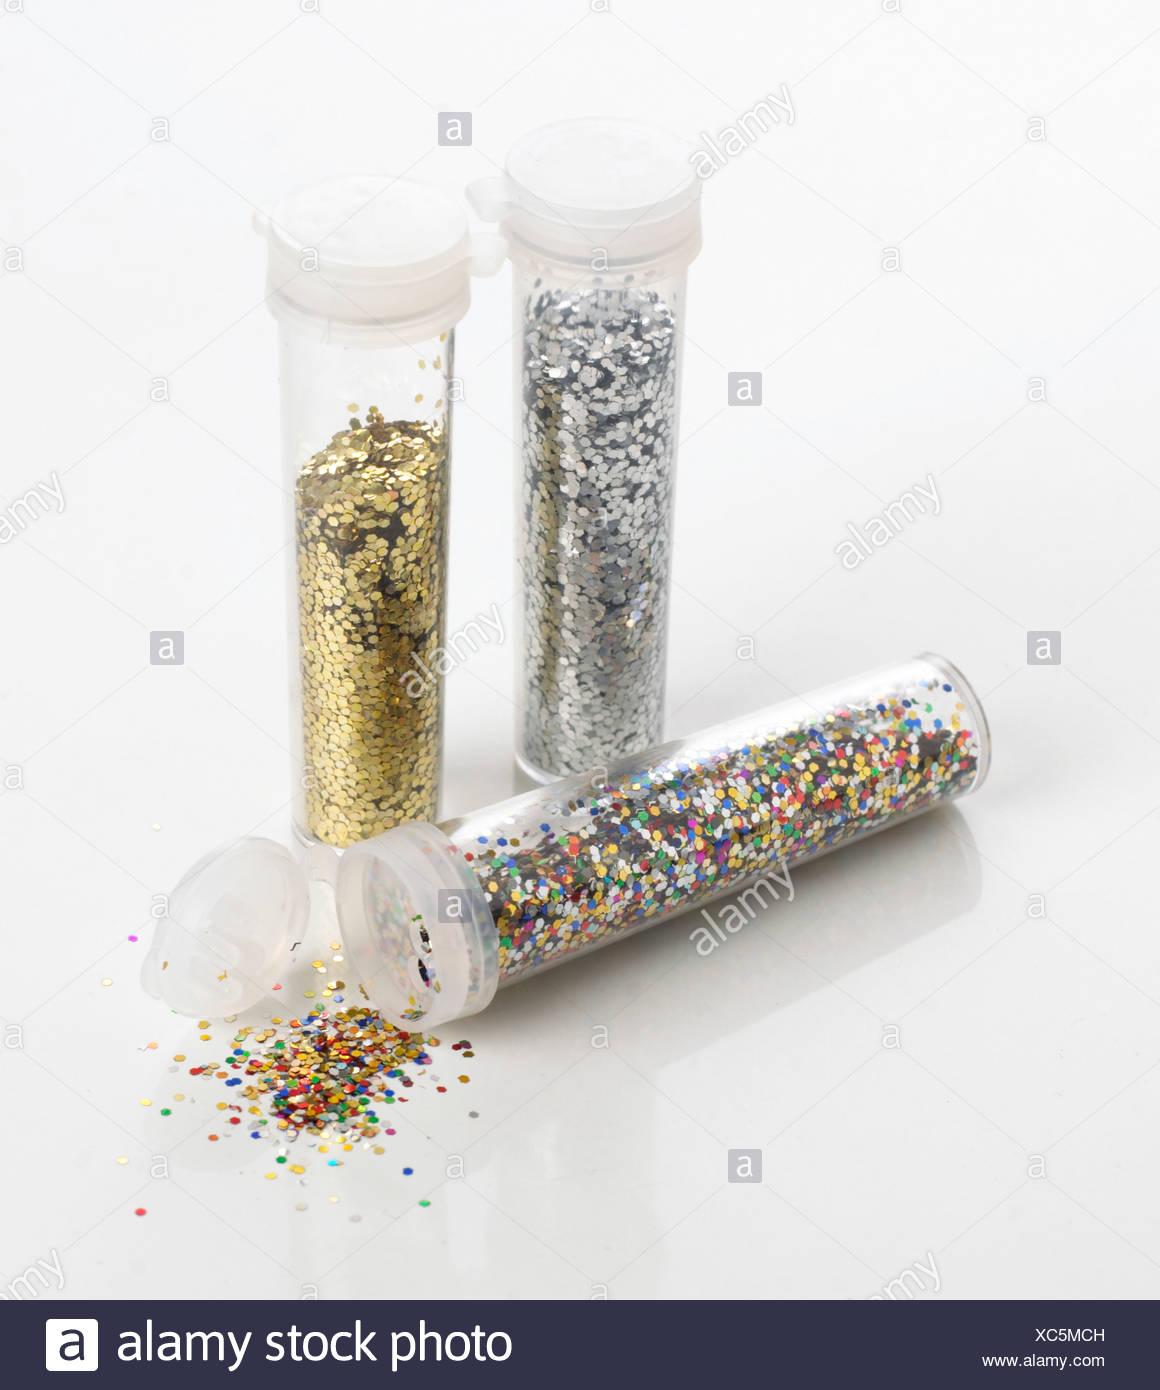 Farbige Glitter, Gold-Glitter und Silber Glitter in Kunststoffrohren. Stockbild